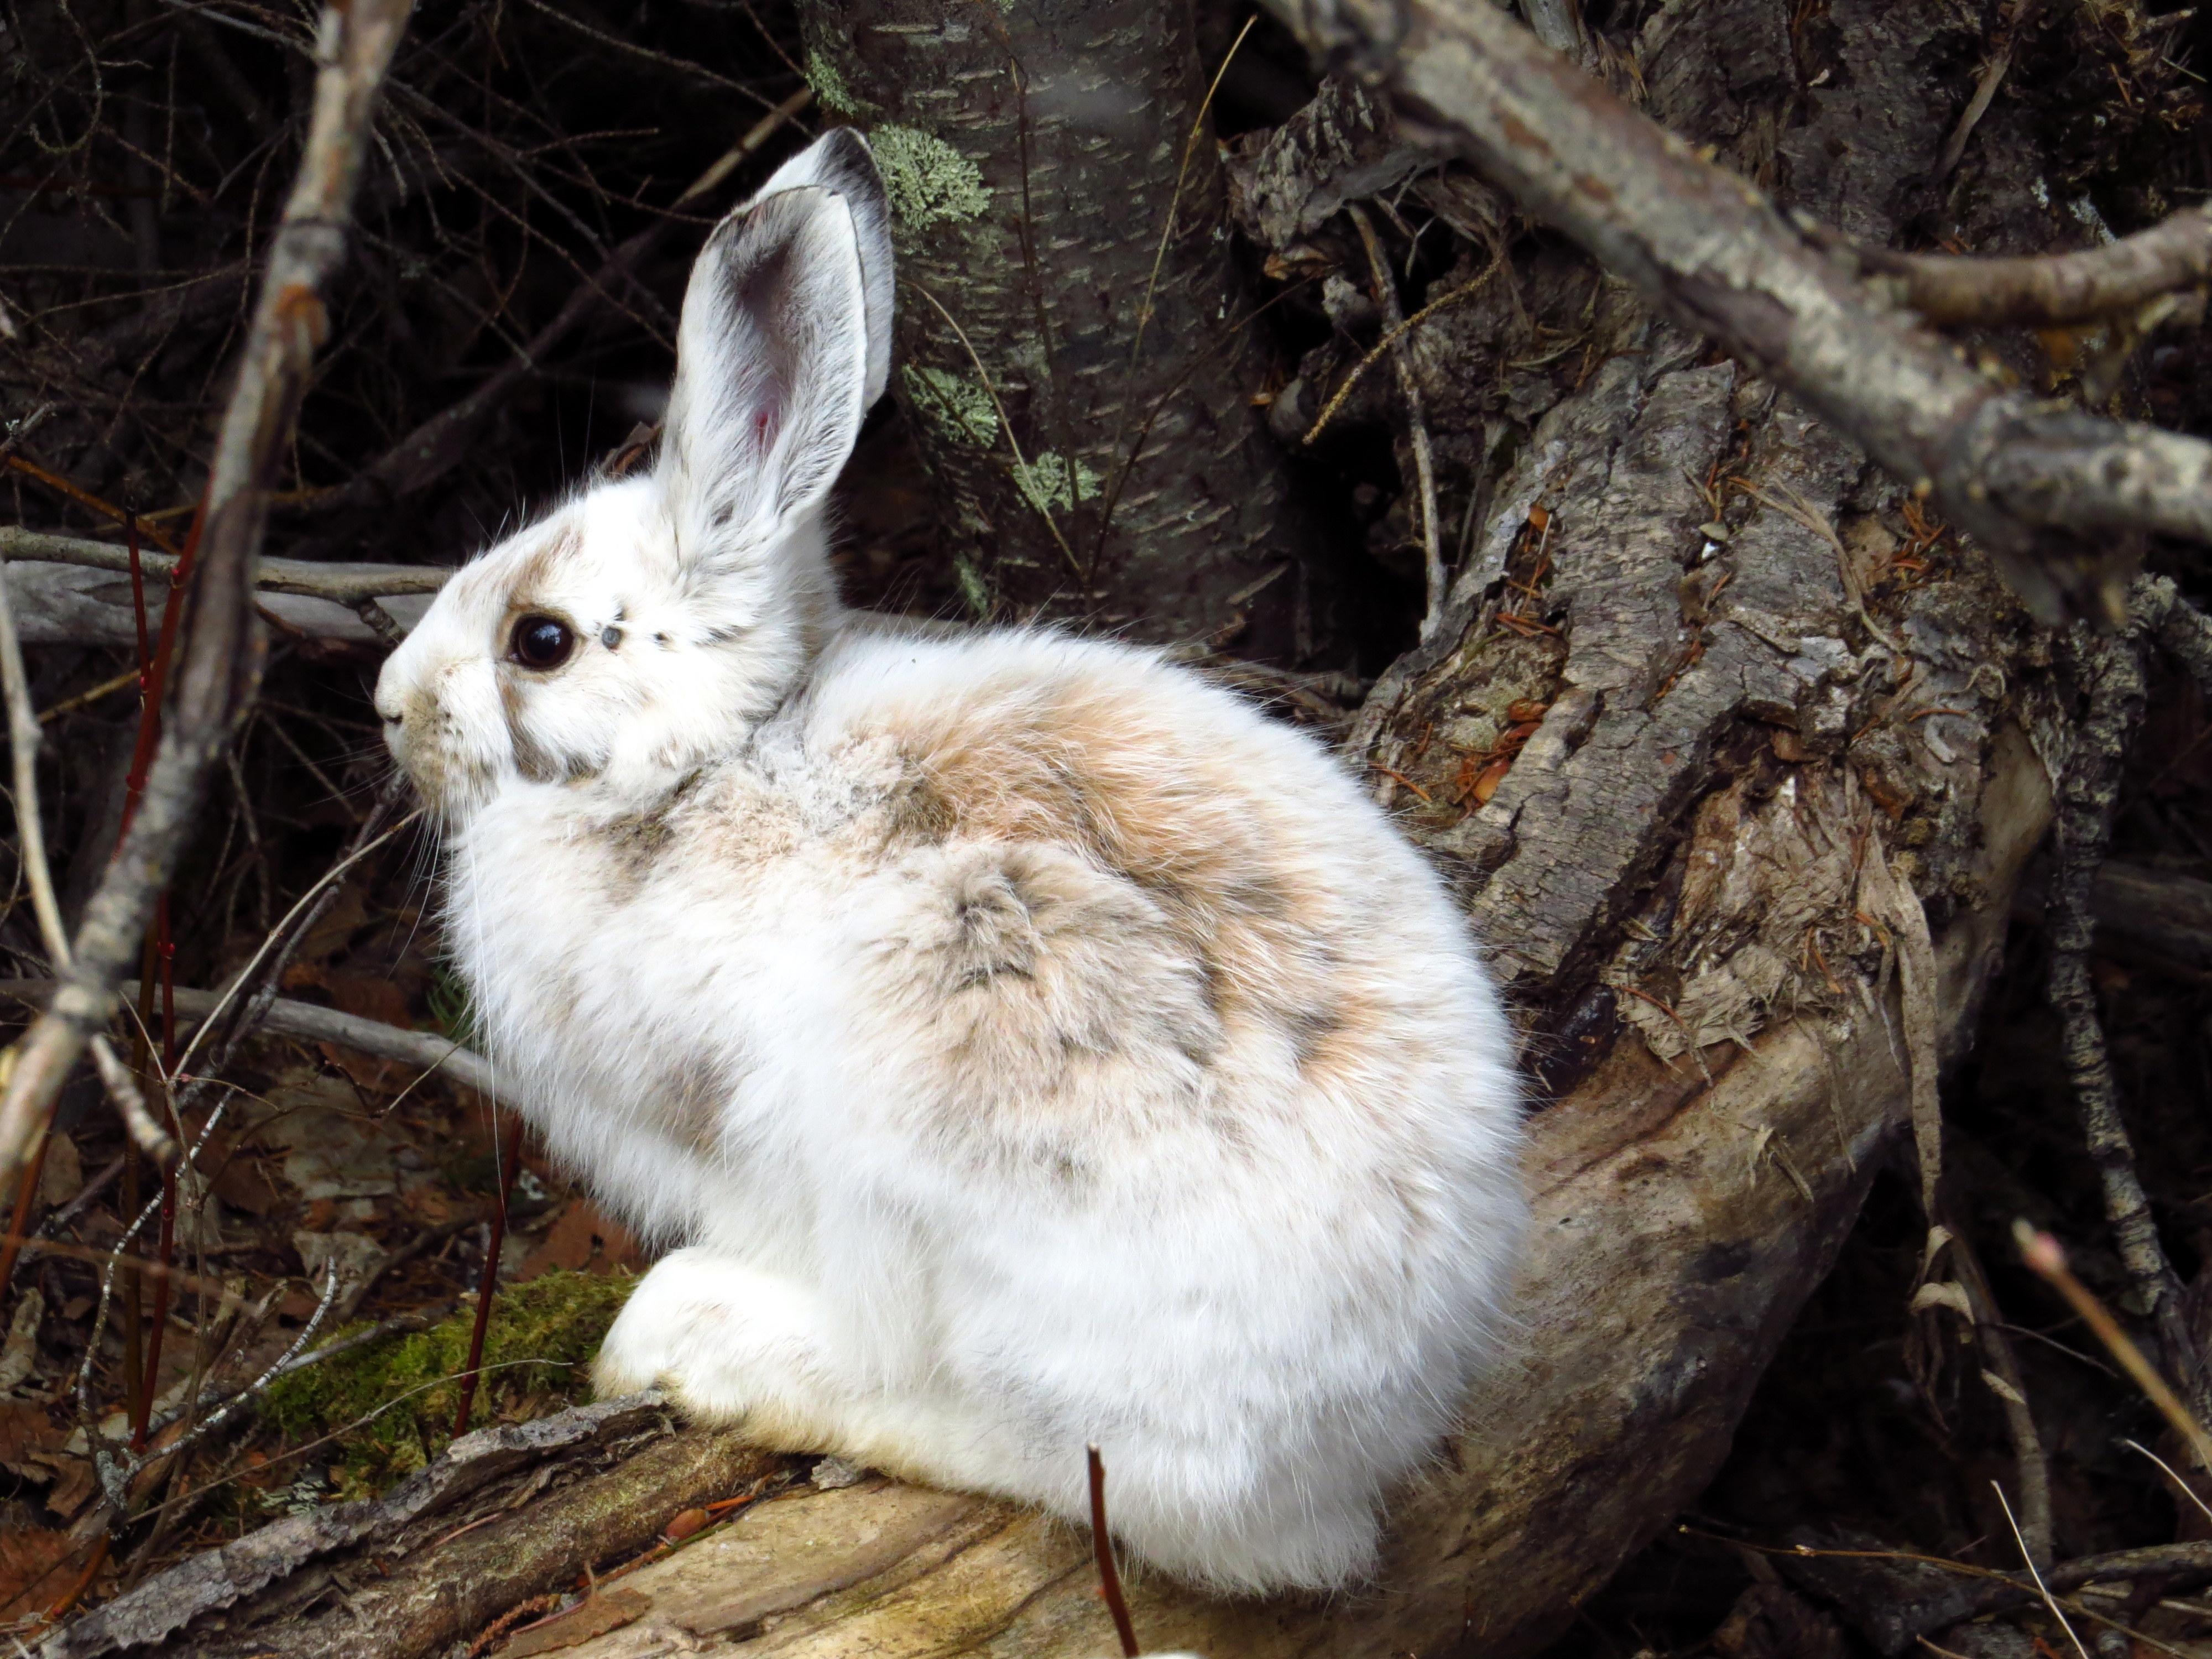 snowshoe_hare_Lepus_americanus_molting_041613_BL.JPG